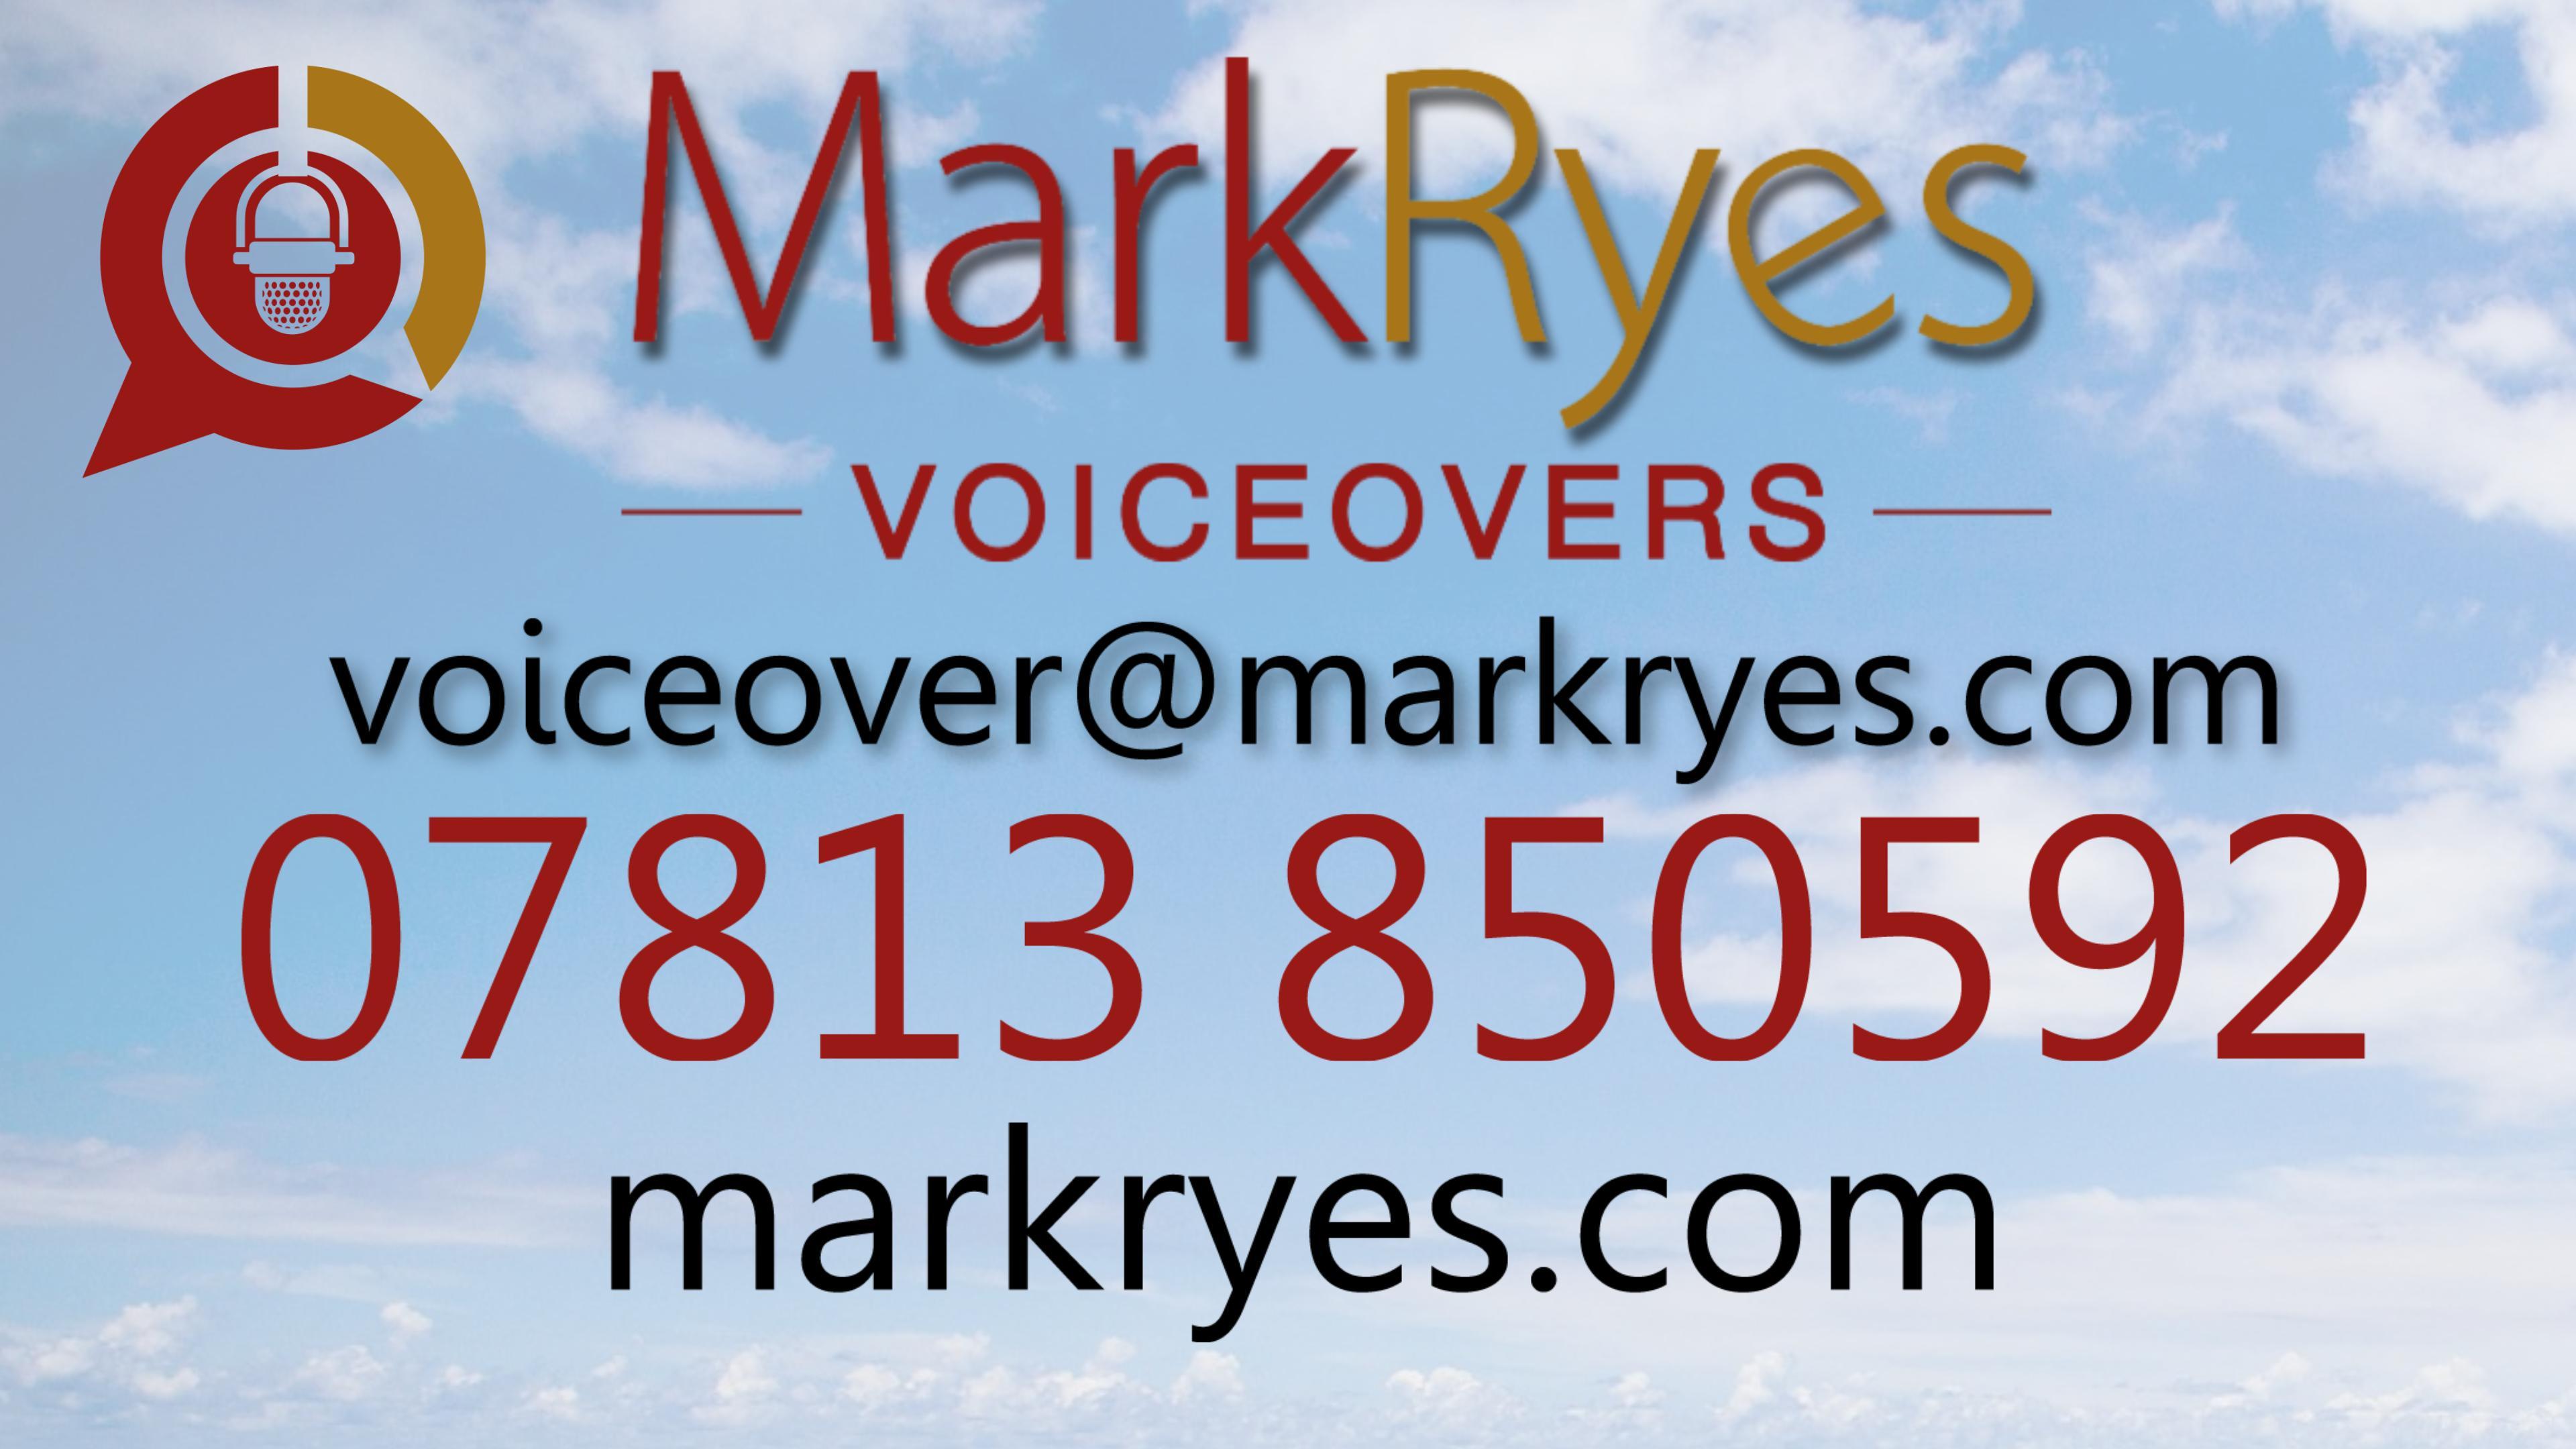 British RP Voiceover Mark Ryes